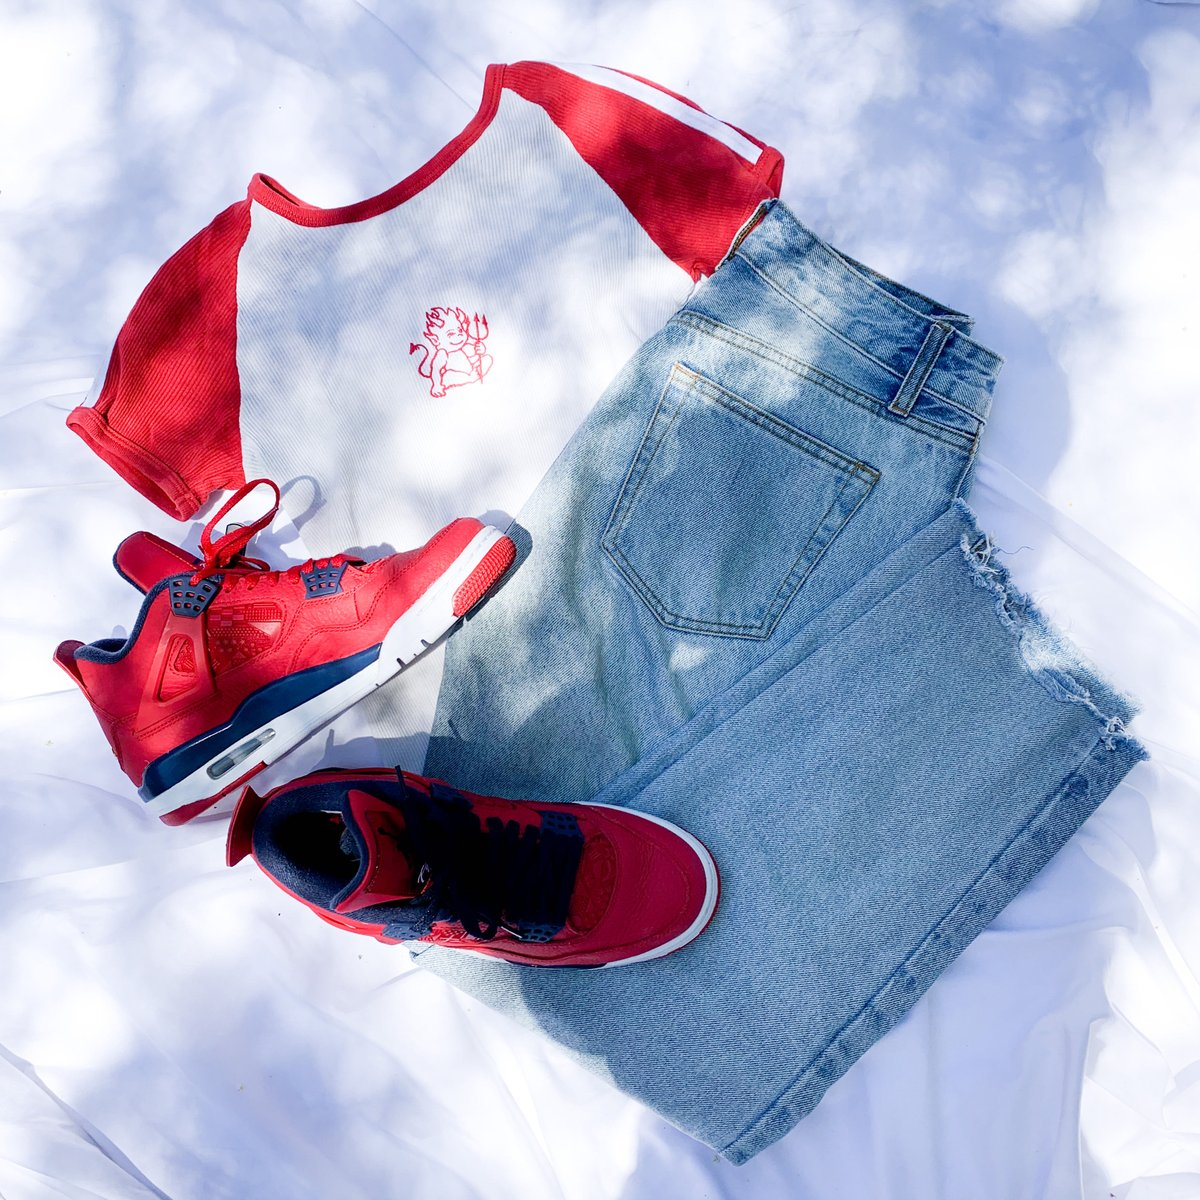 Red denim outfit  Jordan 8 $45 John galt Pants $22 John Galt T-shirt  S $12 #platoscloset #platosclosetemecula #gentlyused #musthave #shop #loveit #temecula #murrieta #fashion #hemet #riverside #fresharrivals #ontrend #lookbook #lookgood #style #styleinspo